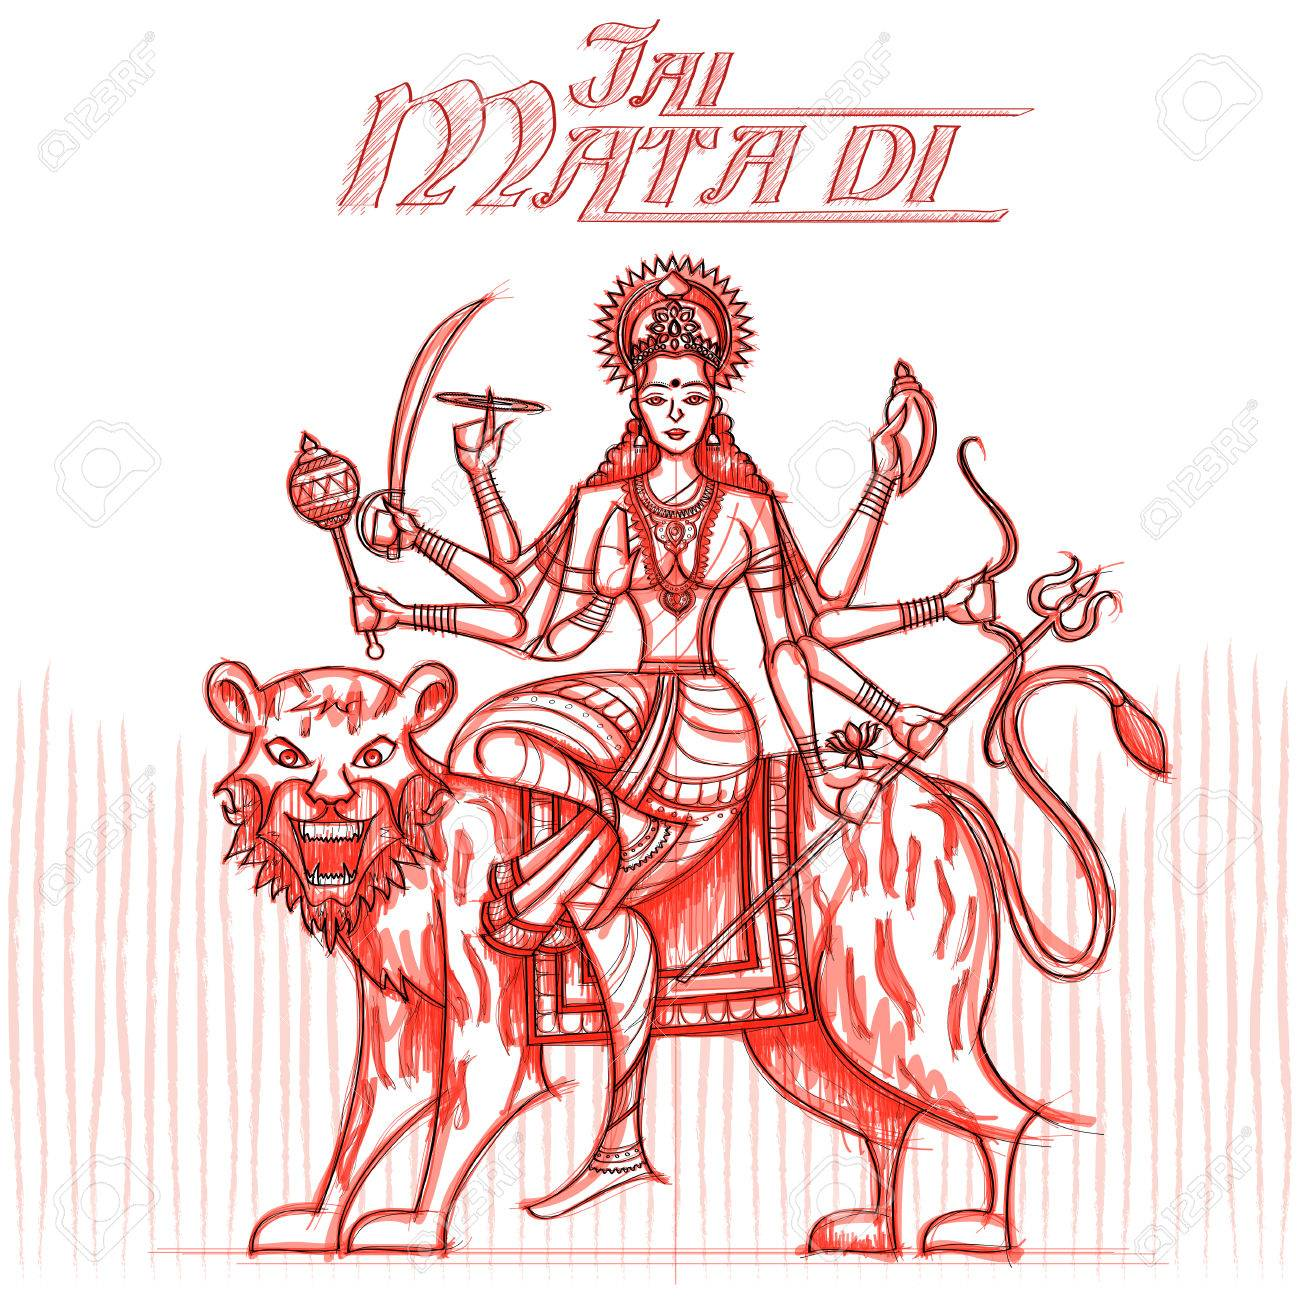 Indian goddess sherawali maa in sketchy look vector illustration stock vector 66437698